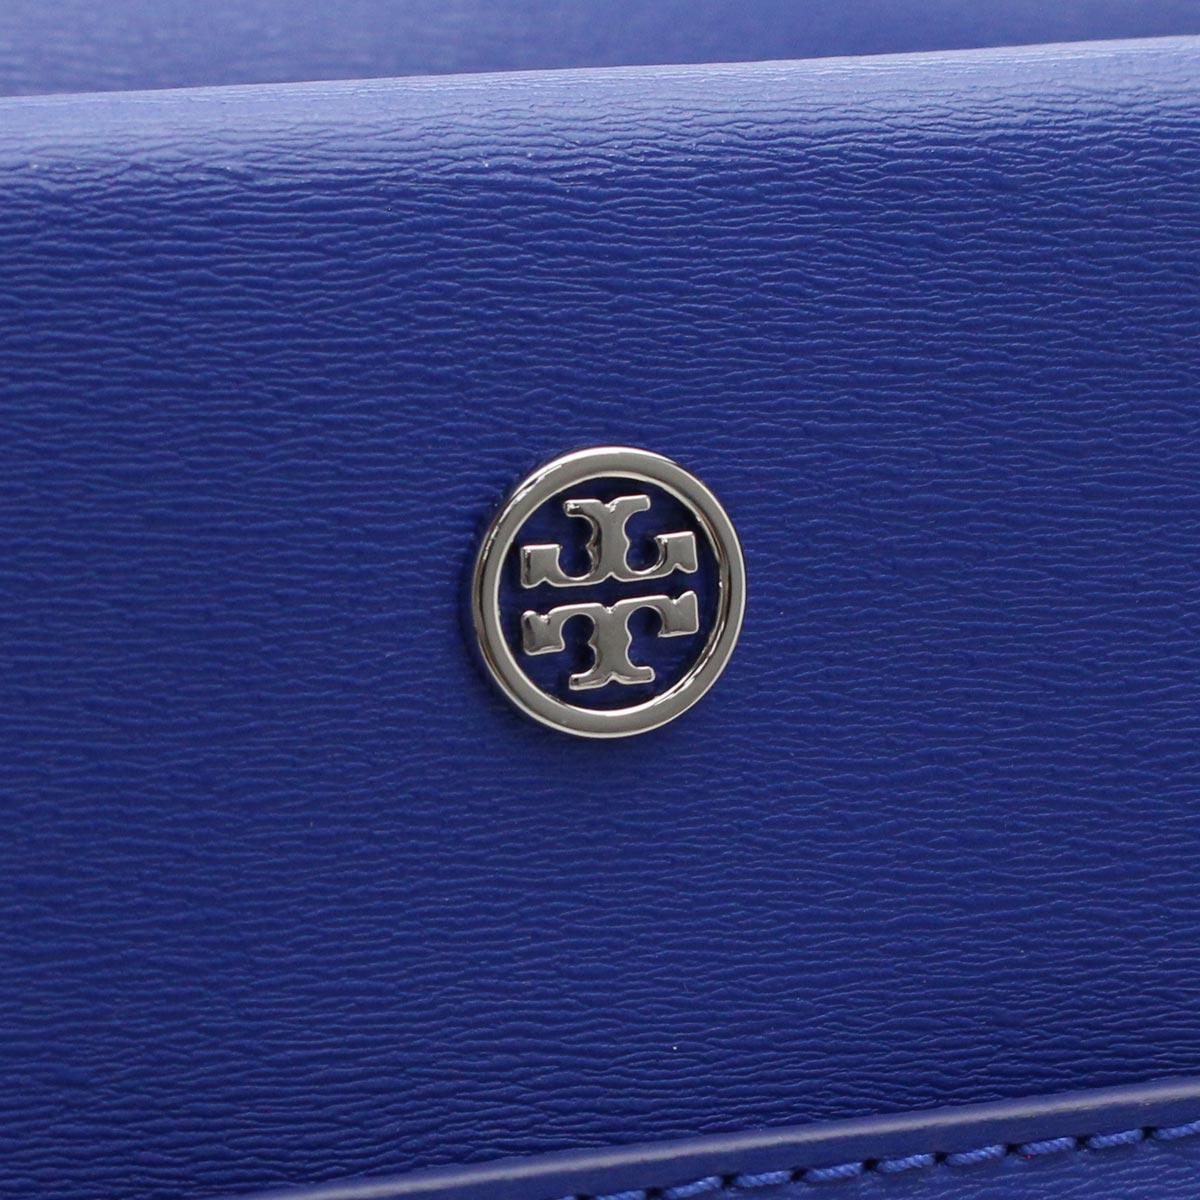 50b0073cbdb ... Tolly Birch (TORY BURCH) PARKER parka tote bag 37744 449 SONGBIRD blue  system ...